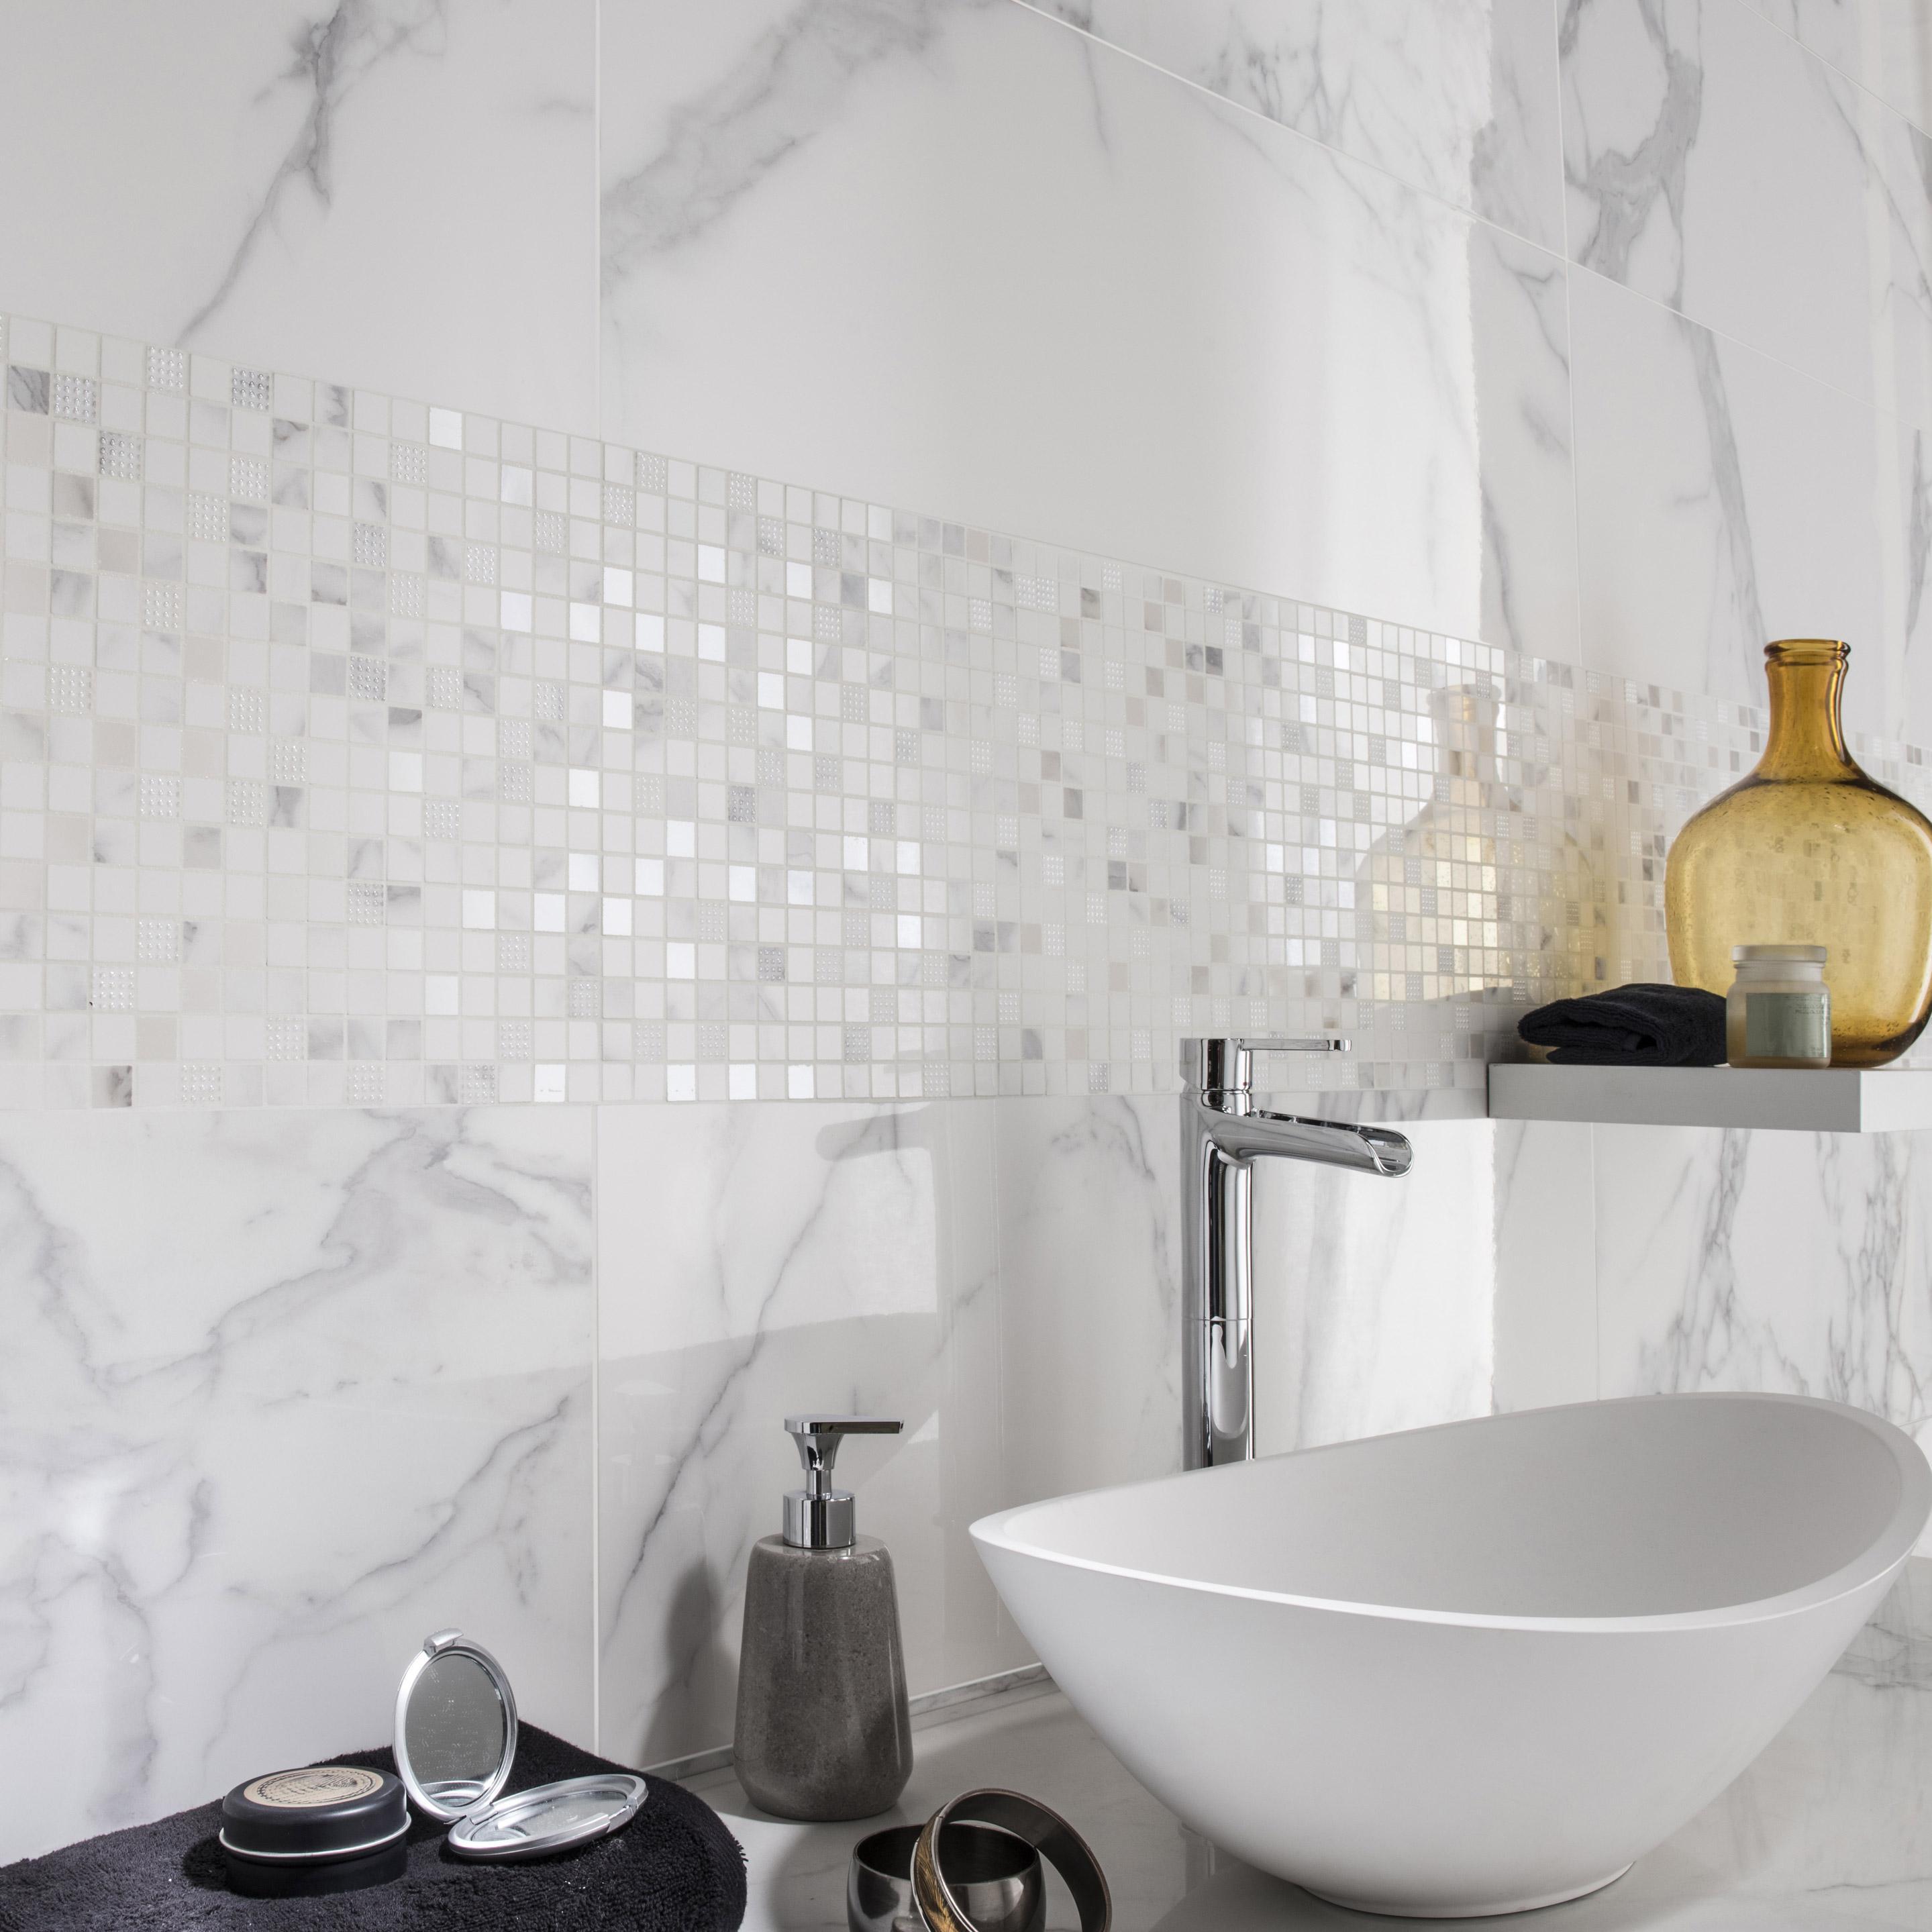 Salle De Bain Marbre De Carrare faïence mur intenso marbre blanc carrare brillant l.30.5 x l.91.5 cm, murano